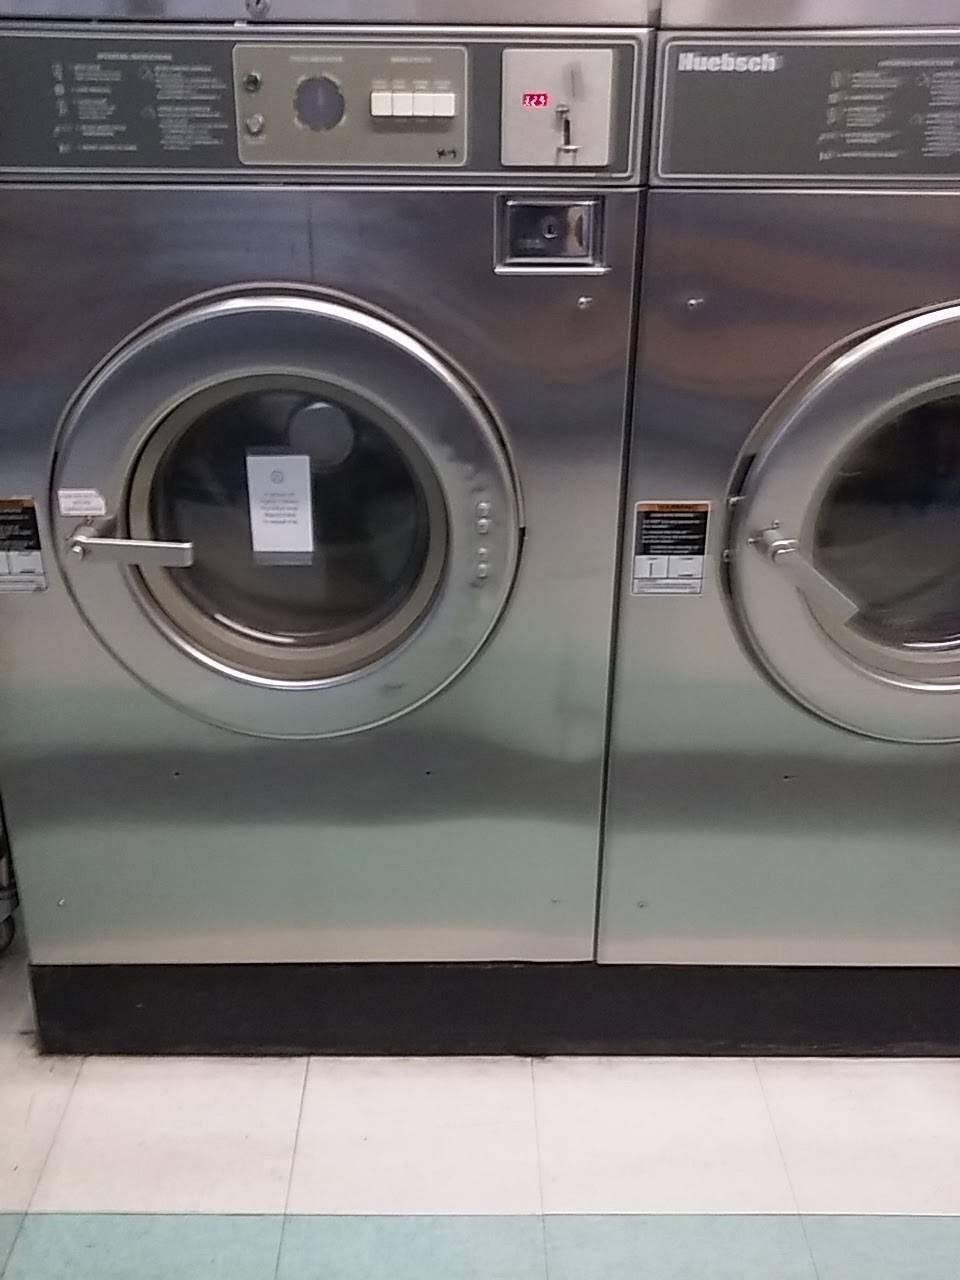 Kims Coin Laundry & Dry Cleaners - laundry  | Photo 1 of 10 | Address: 4450 E Charleston Blvd # 4, Las Vegas, NV 89104, USA | Phone: (702) 489-4417